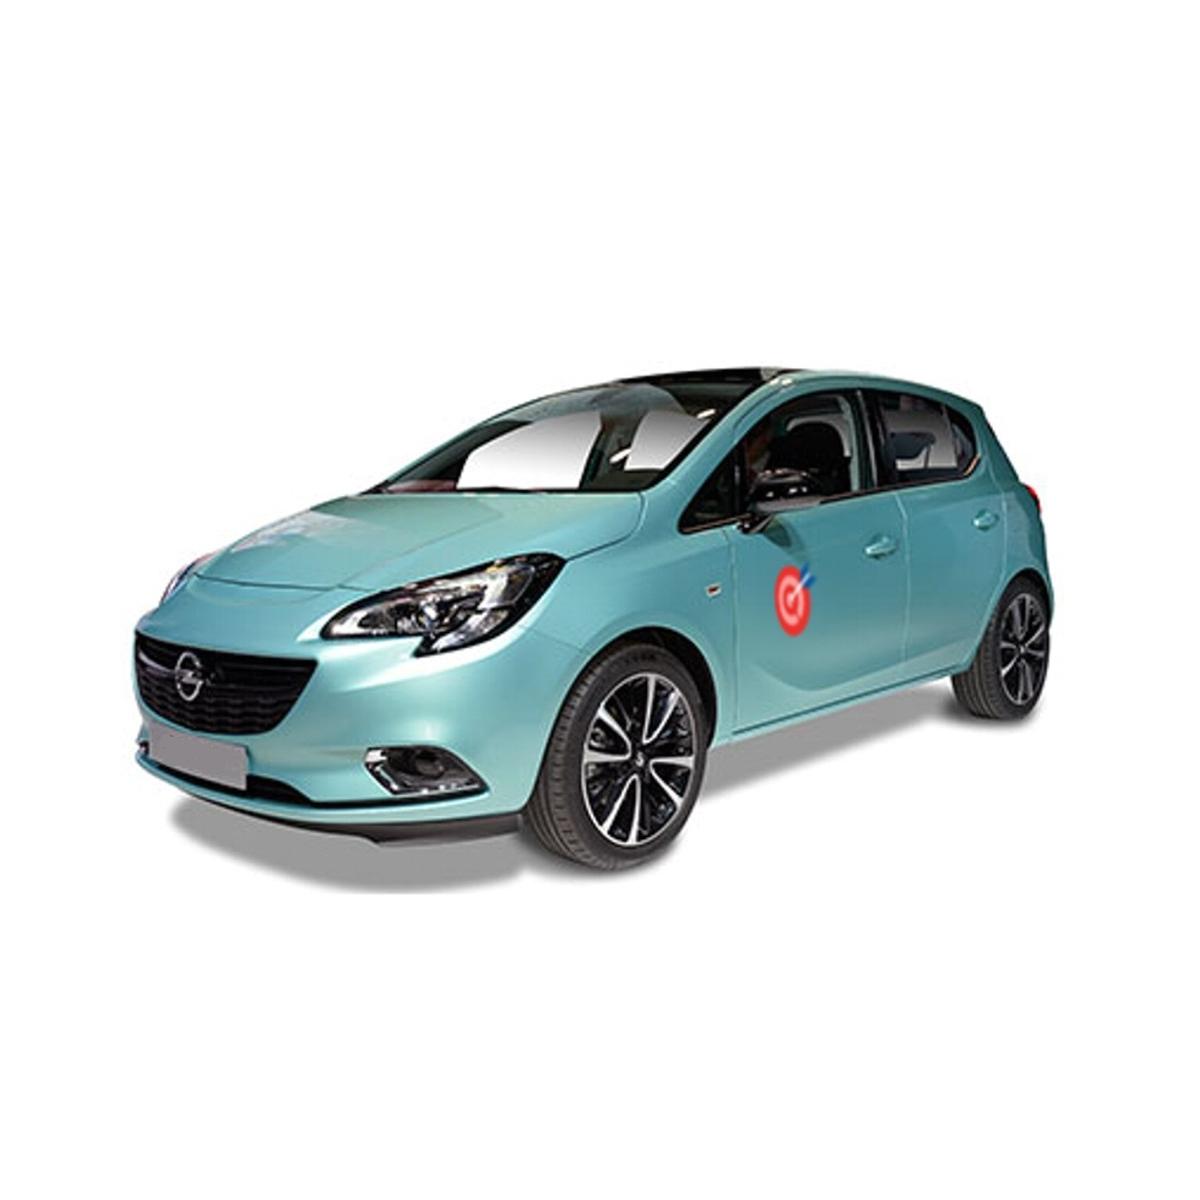 Automatic Opel Corsa